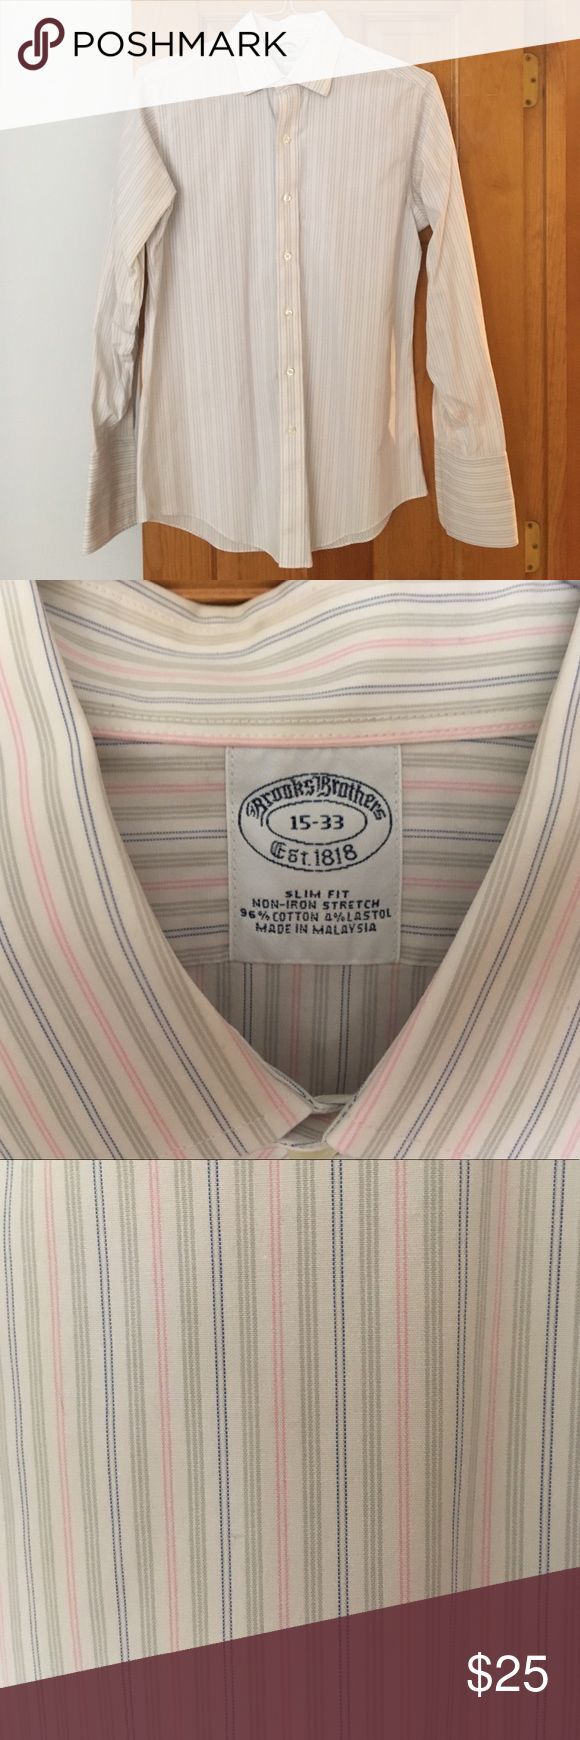 Brooks Brothers Slim Fit Non-iron dress shirt Brooks Brothers Slim Fit Non-iron dress shirt in excellent condition. Brooks Brothers Shirts Dress Shirts